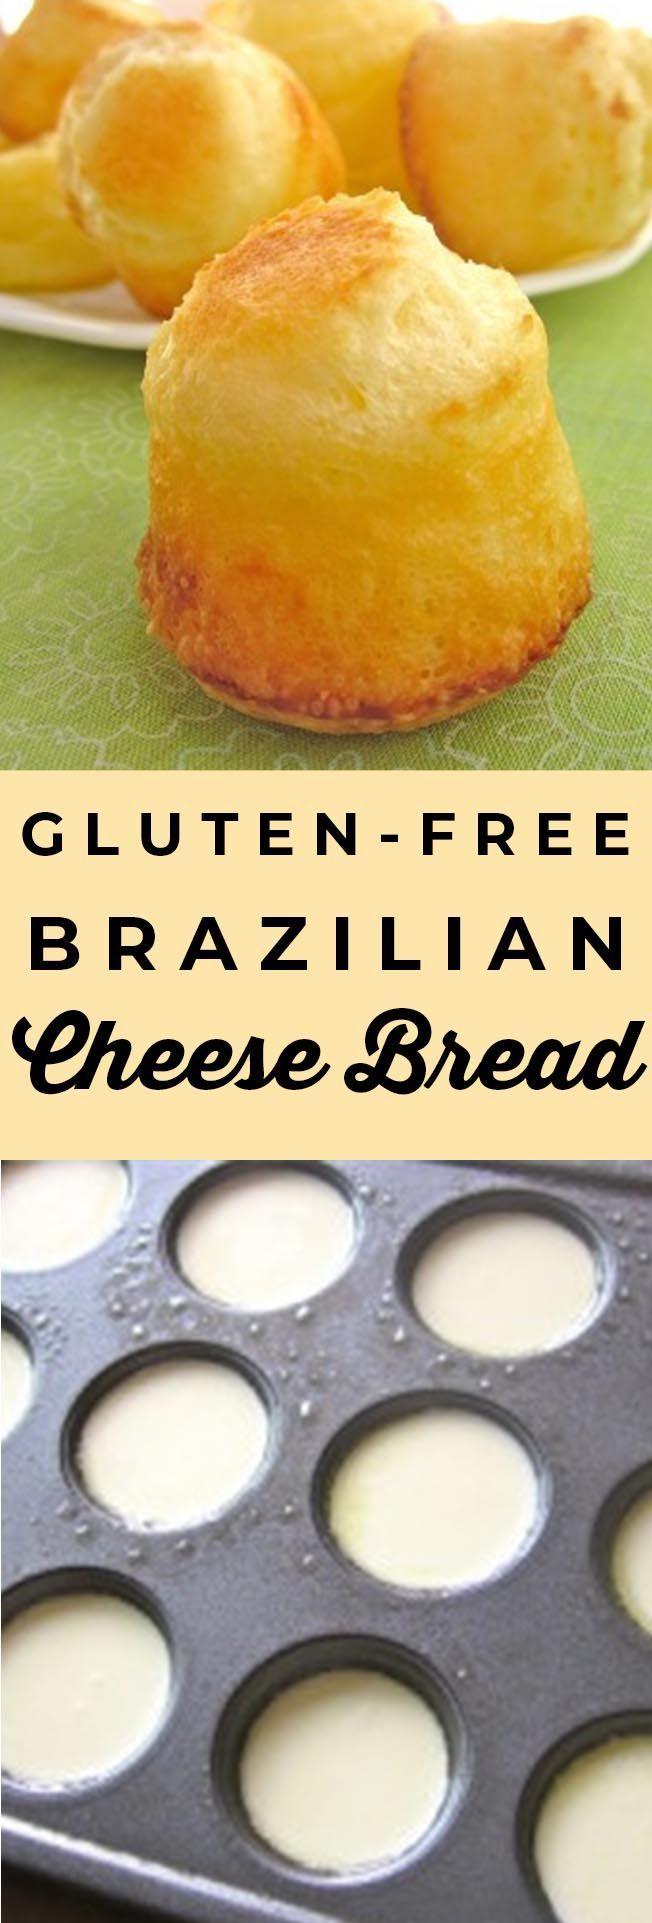 Gluten-Free Brazilian Cheese Bread (Pao de Queijo) from The Food Charlatan